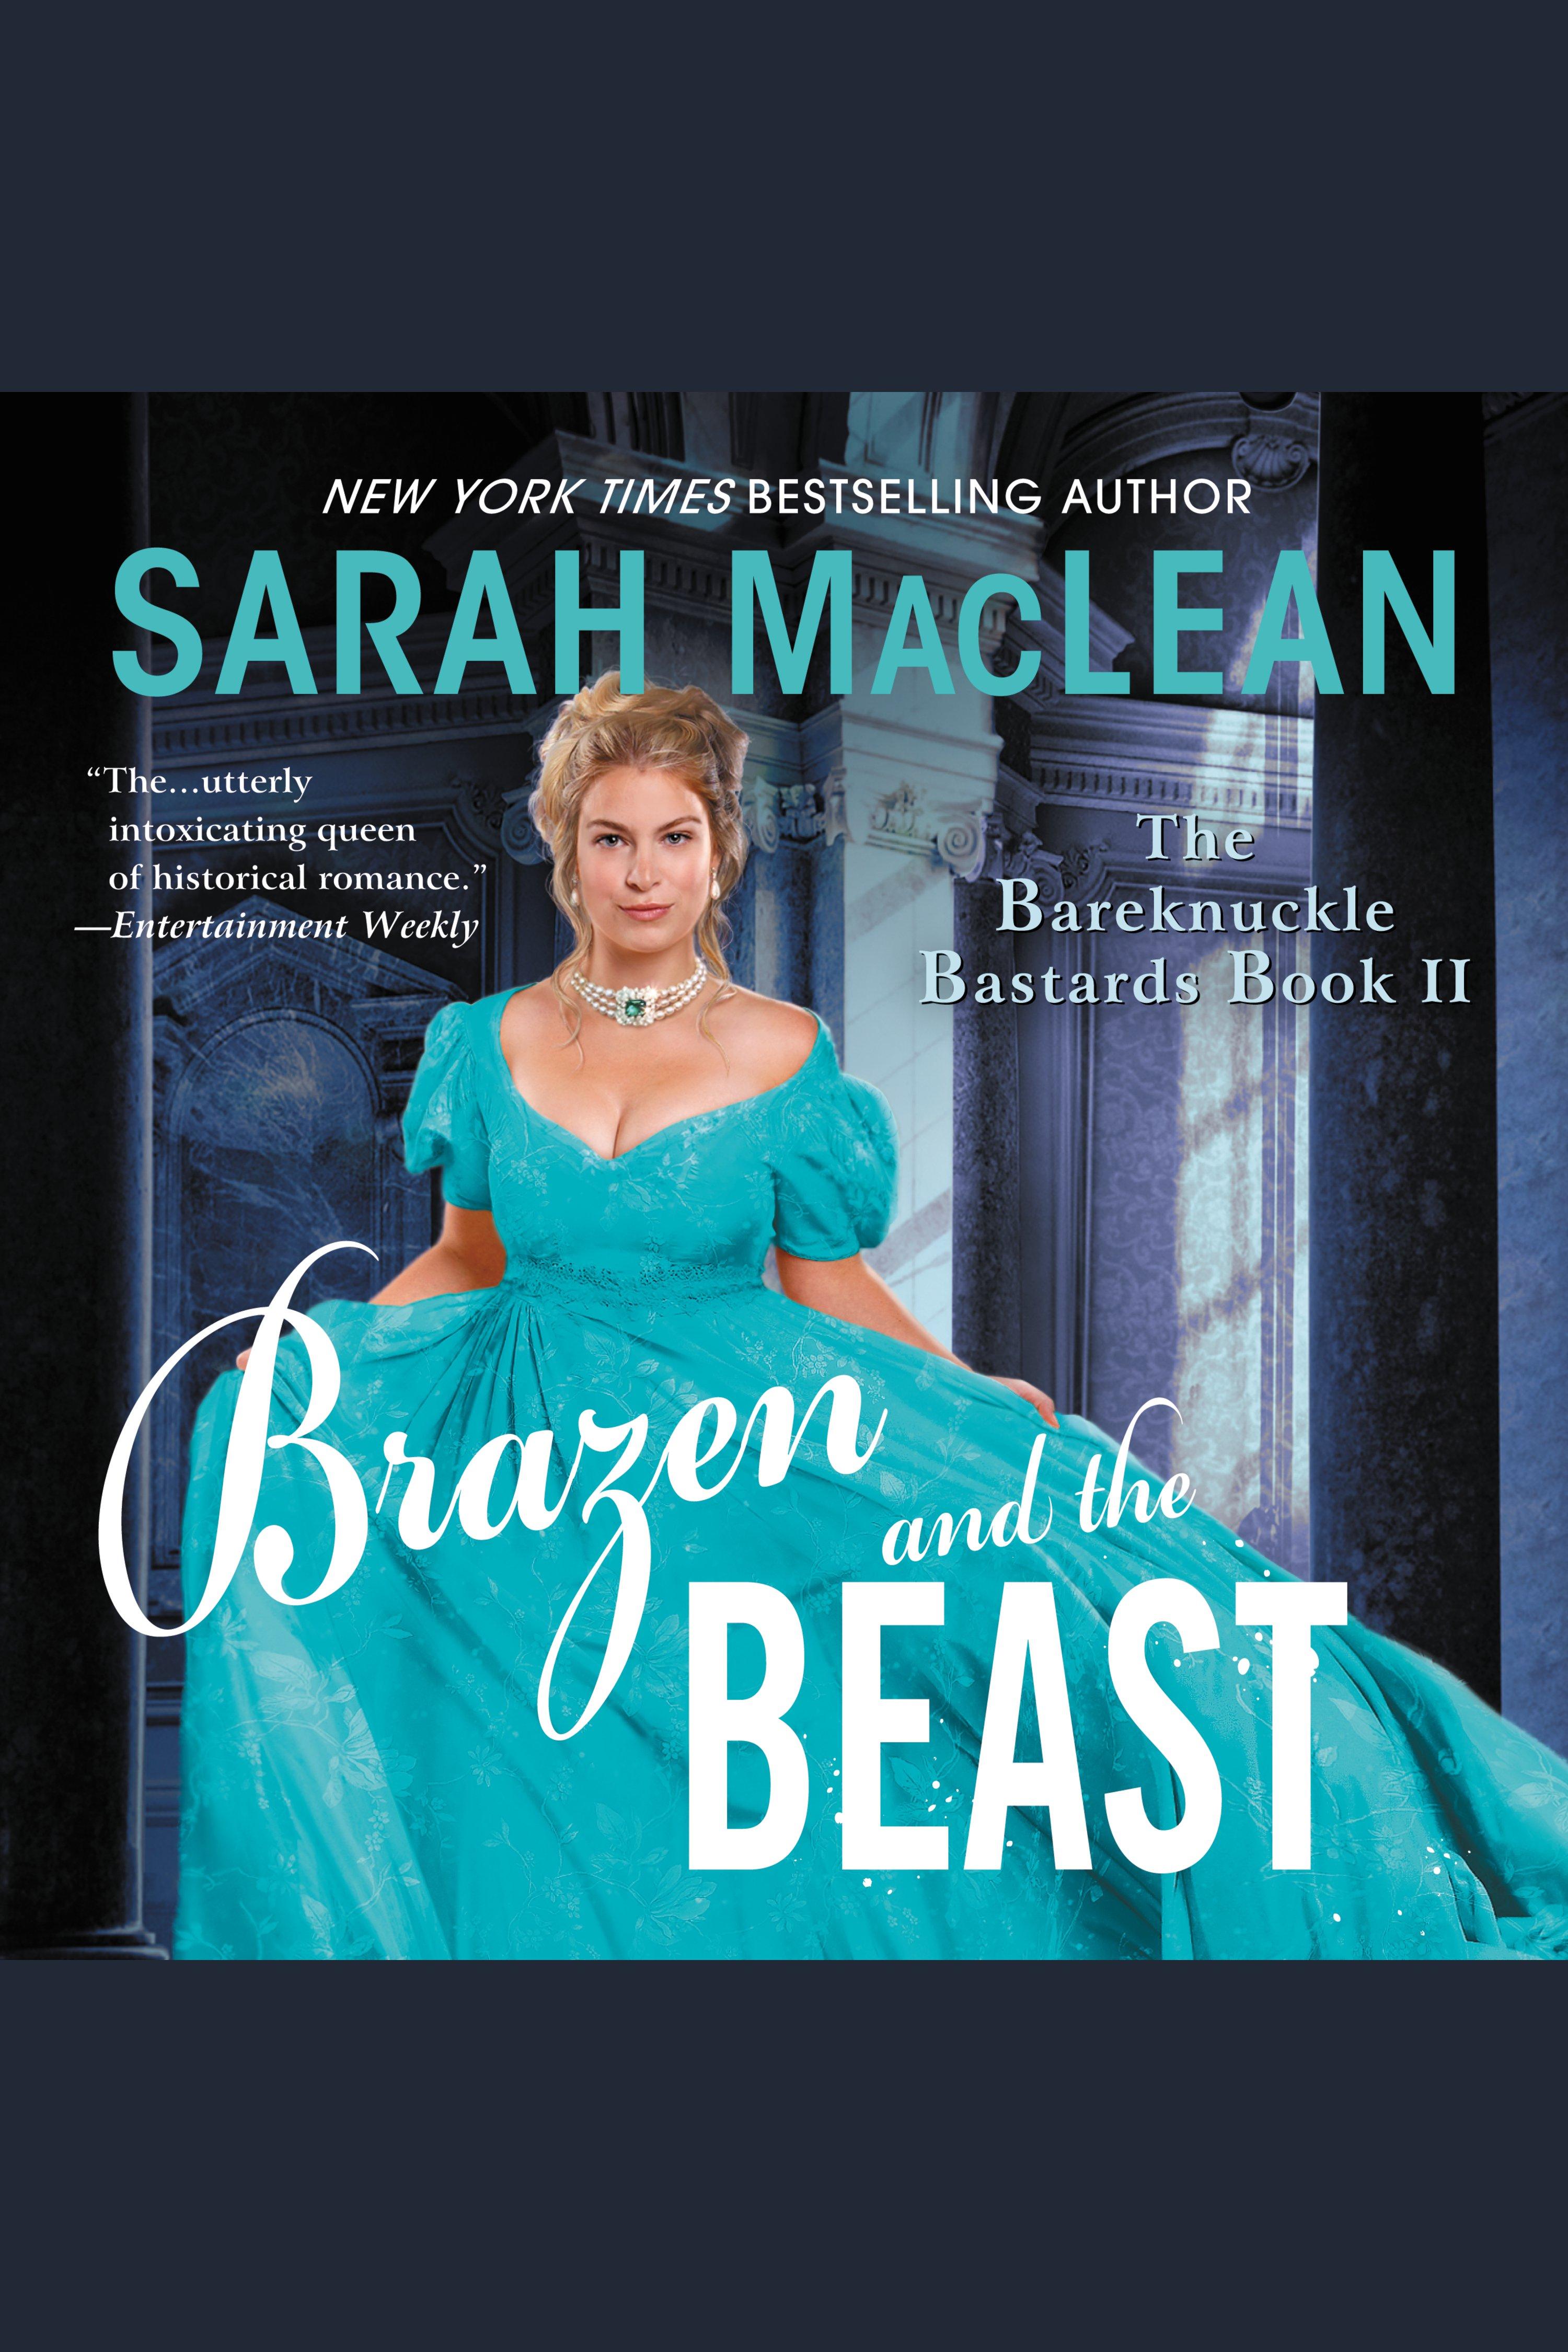 Brazen and the Beast The Bareknuckle Bastards, Book II